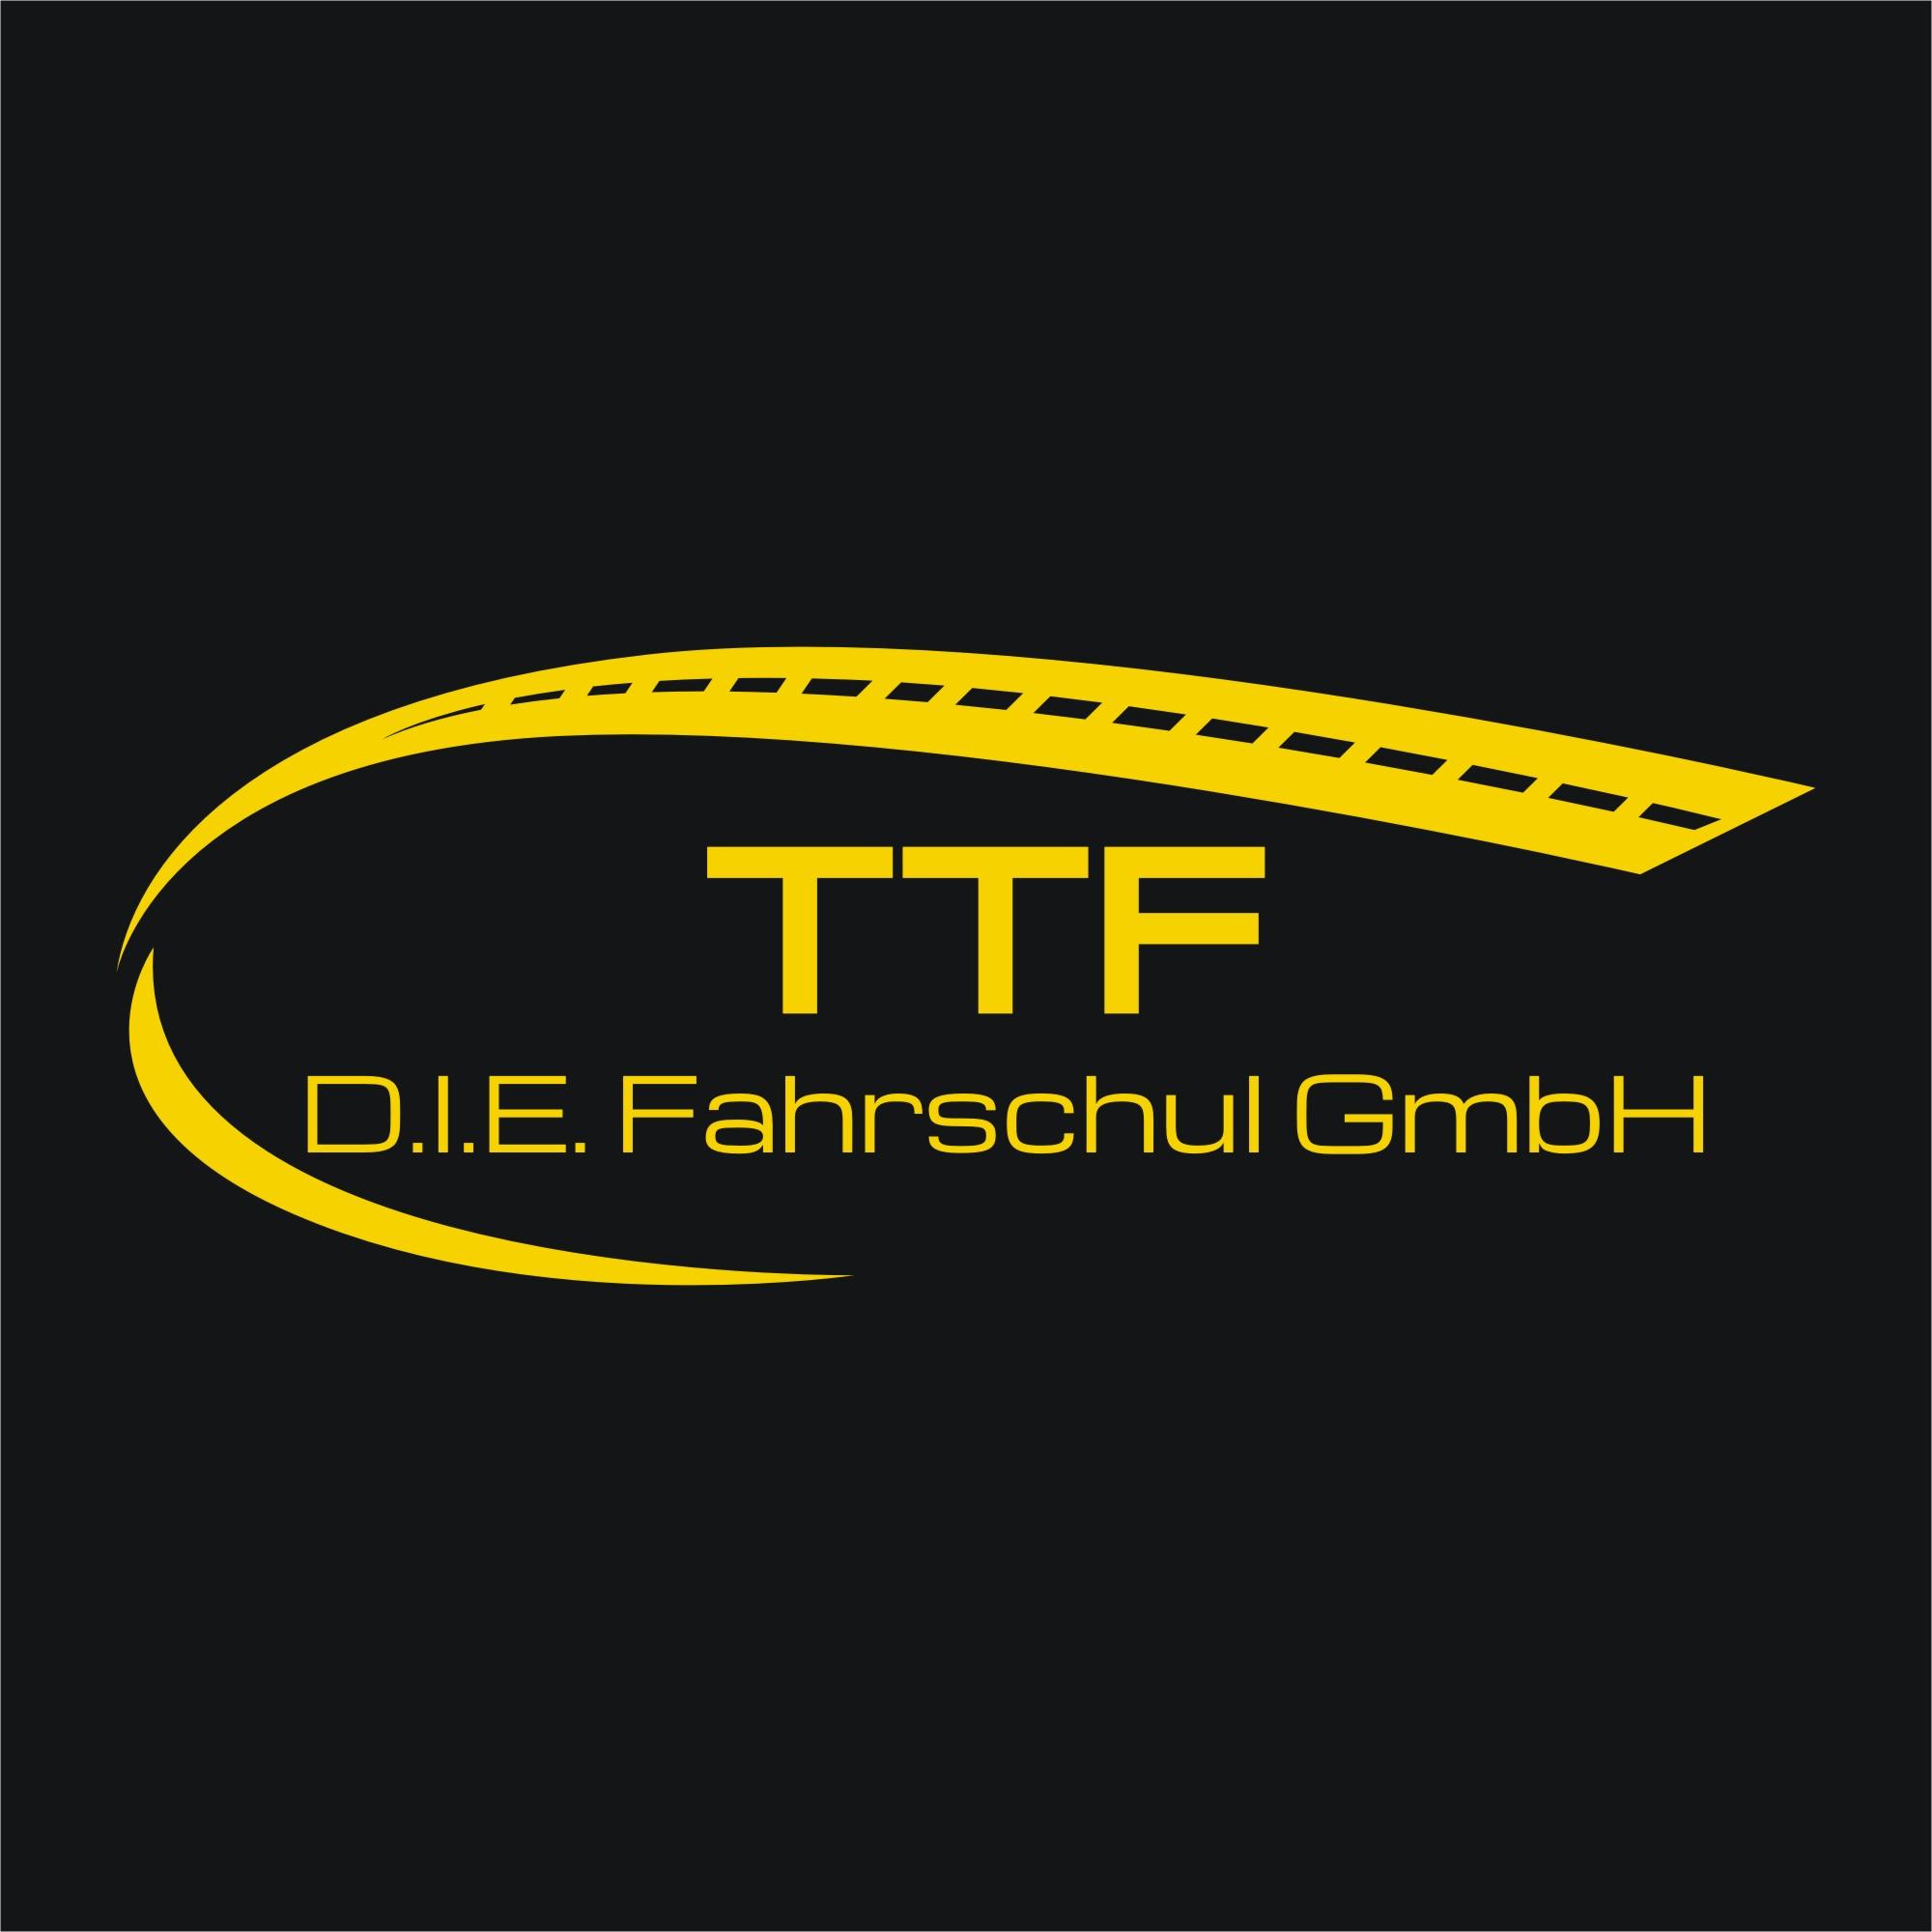 TTF Die Fahrschule GmbH